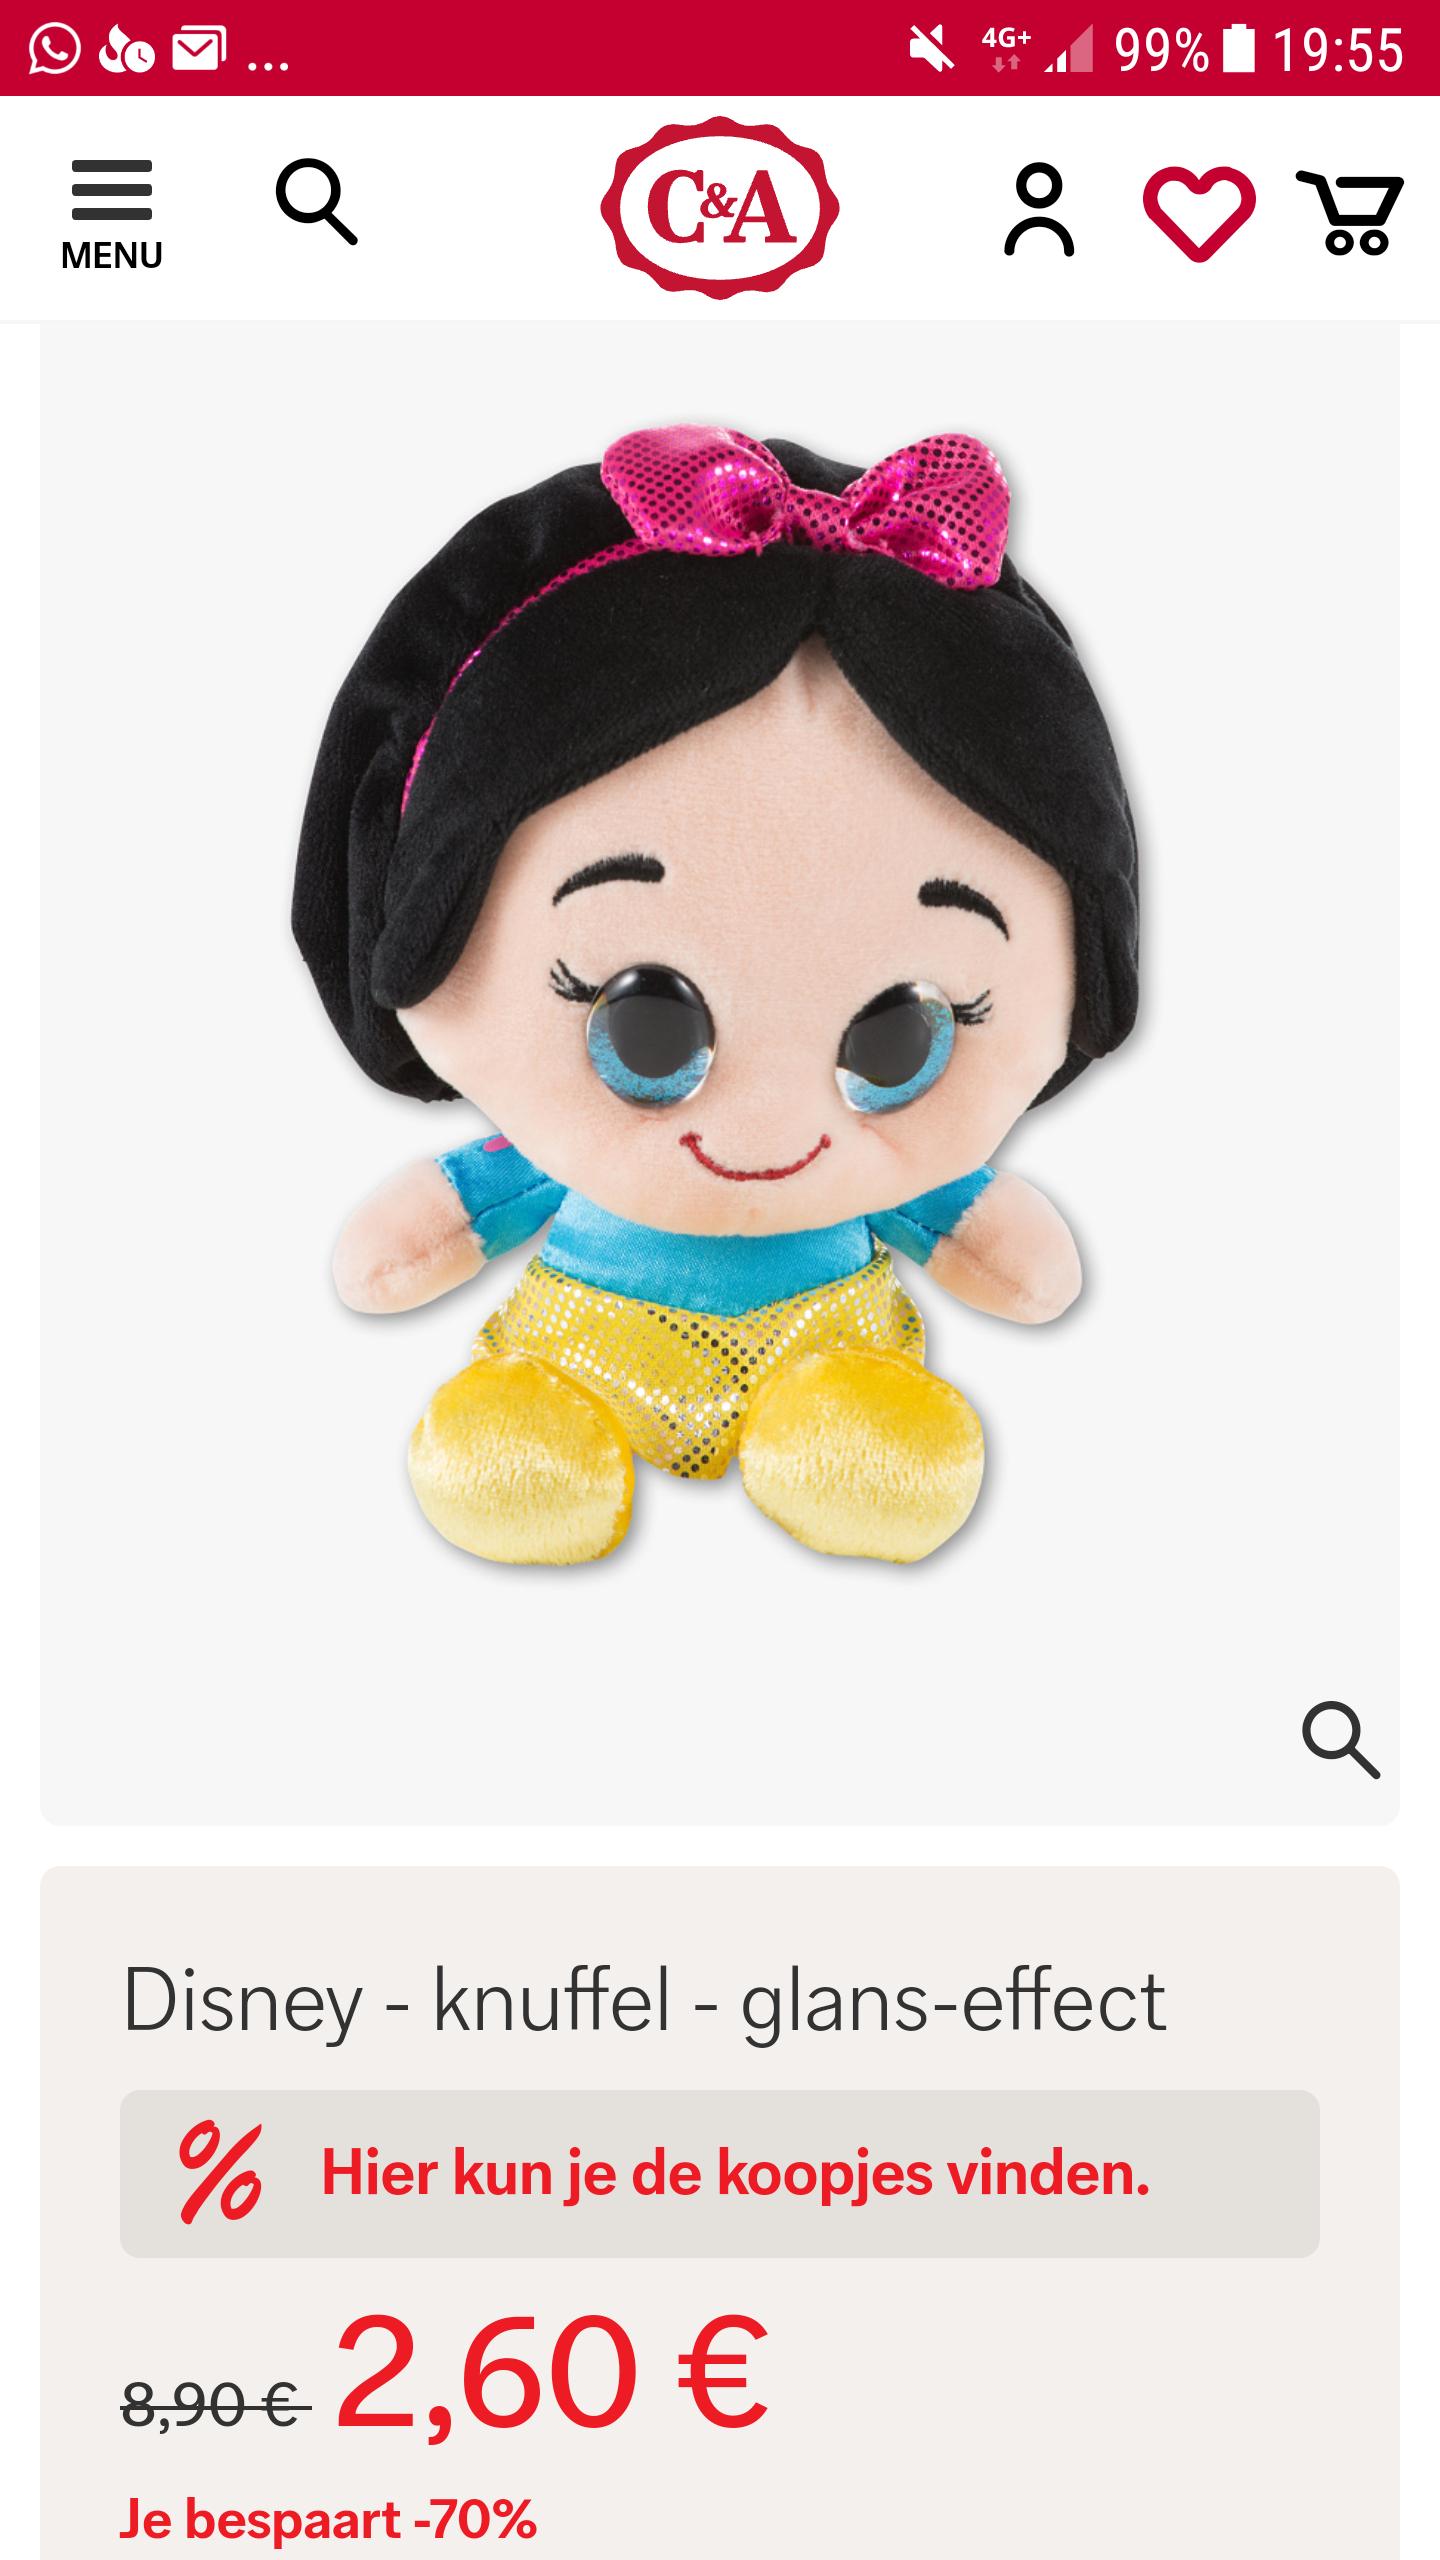 70% korting op Disney knuffel bij C&A